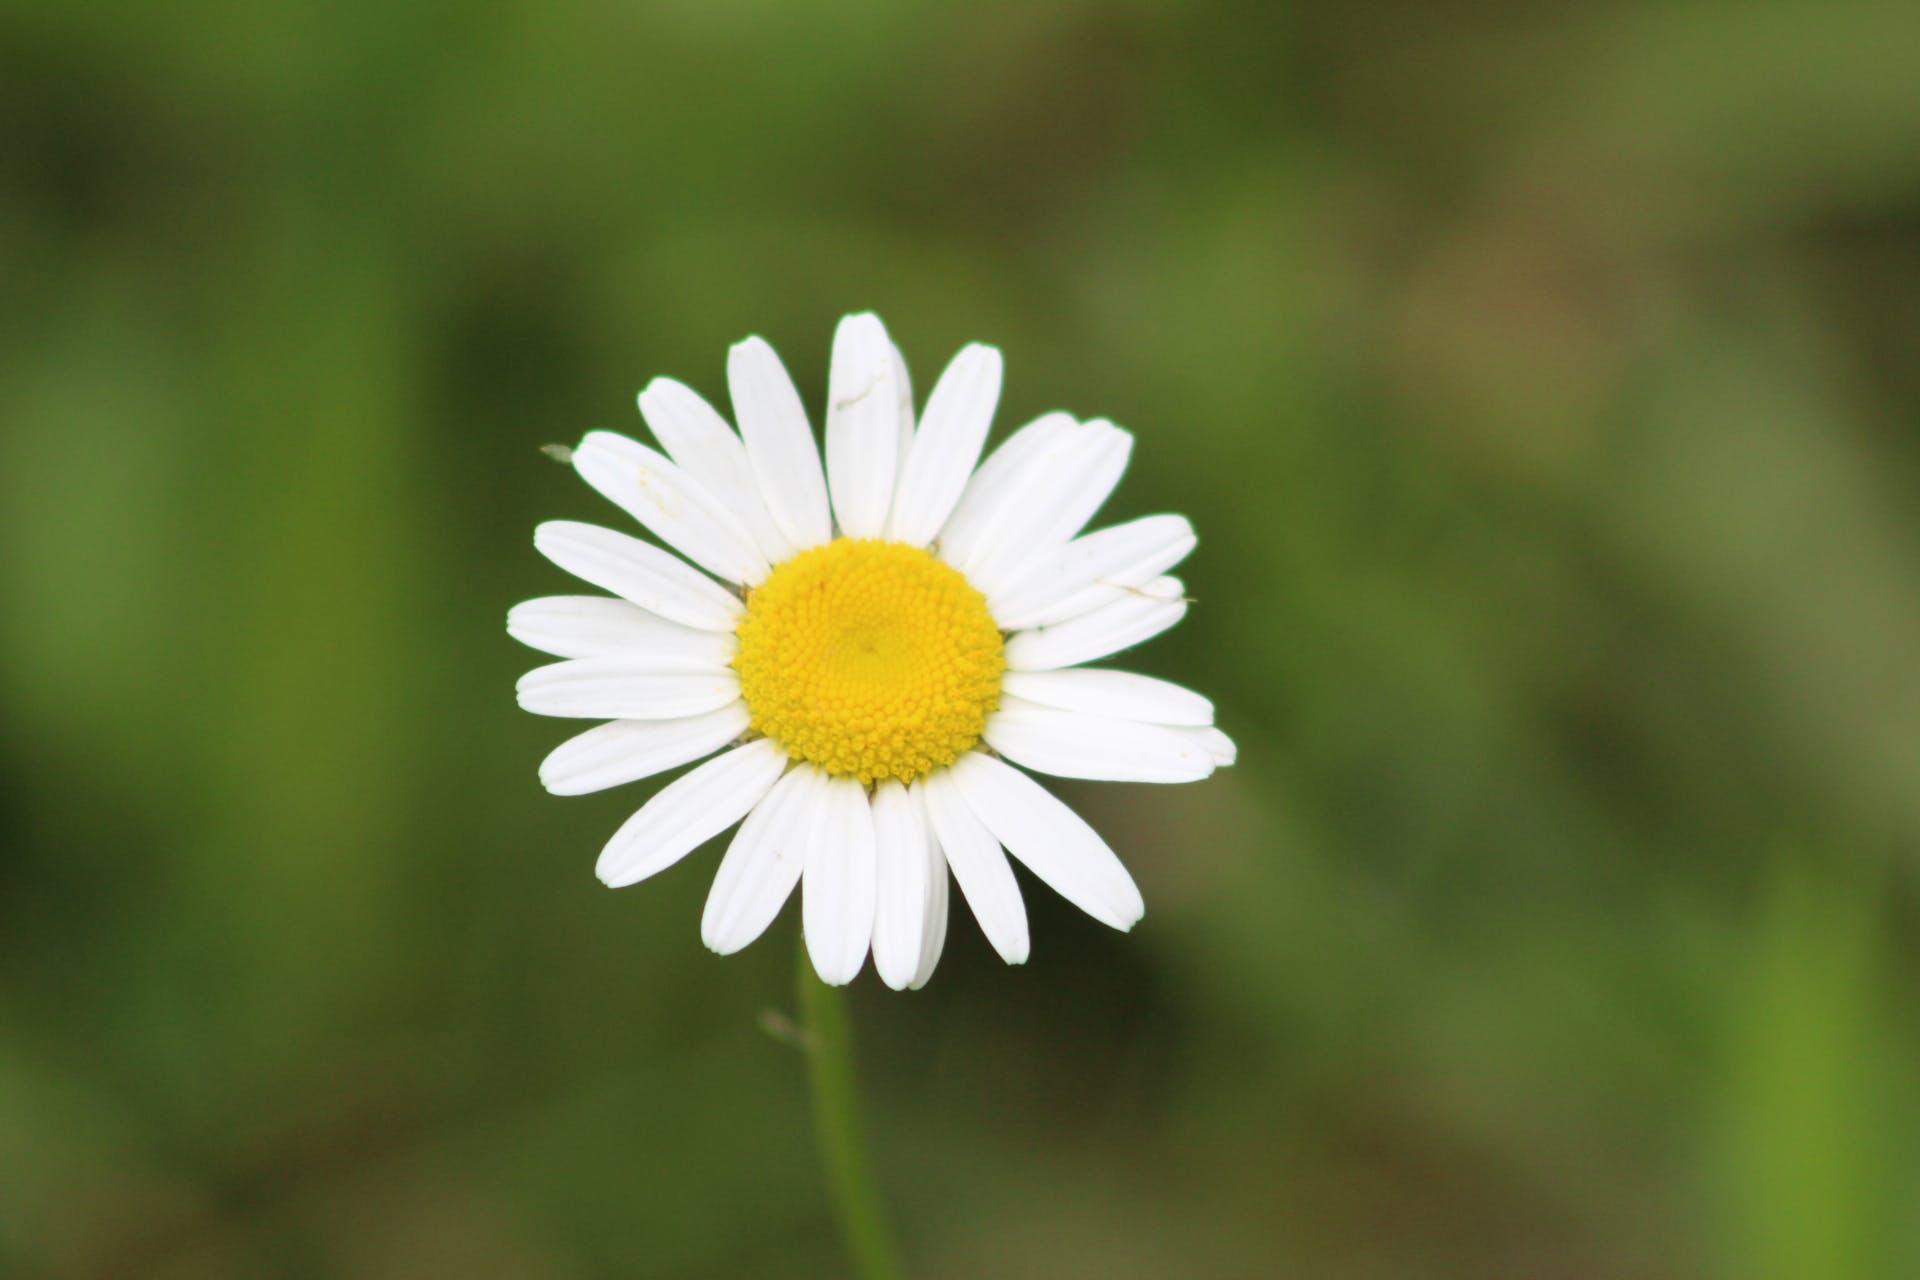 Free stock photo of daisies, daisy, flowers, nature